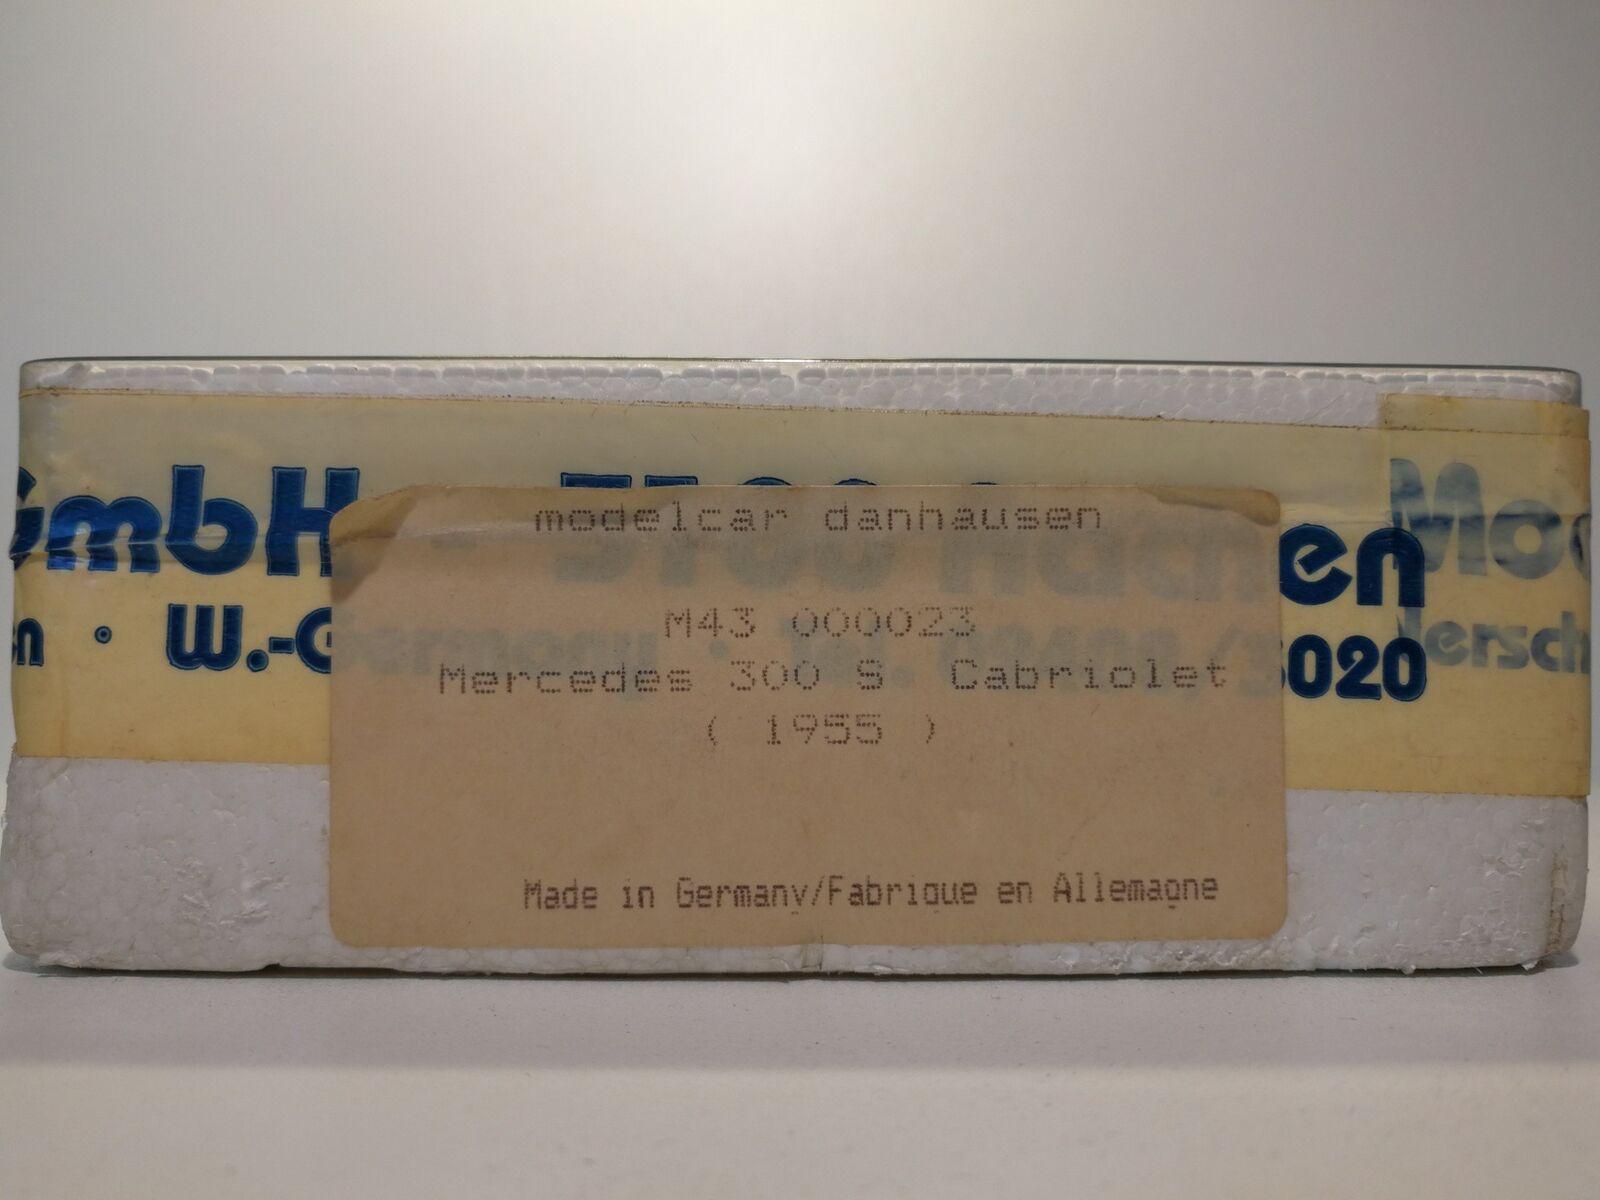 Cadeau de noel noel noel DANHAUSEN MERCEDES 300 S Cabriolet de 1955 m1.43 Kit neu&ovp | Achats En Ligne  933e0b